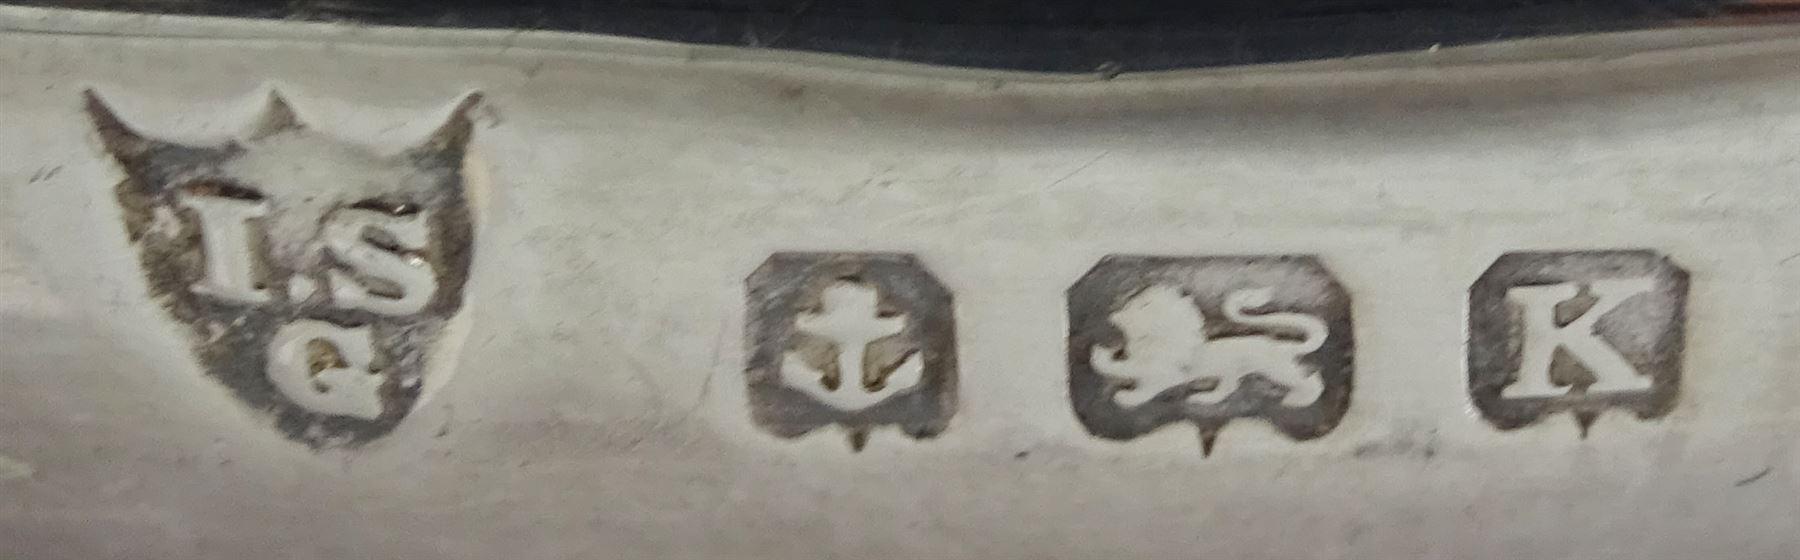 Three piece cruet set by I S Greenberg & Co - Image 3 of 4